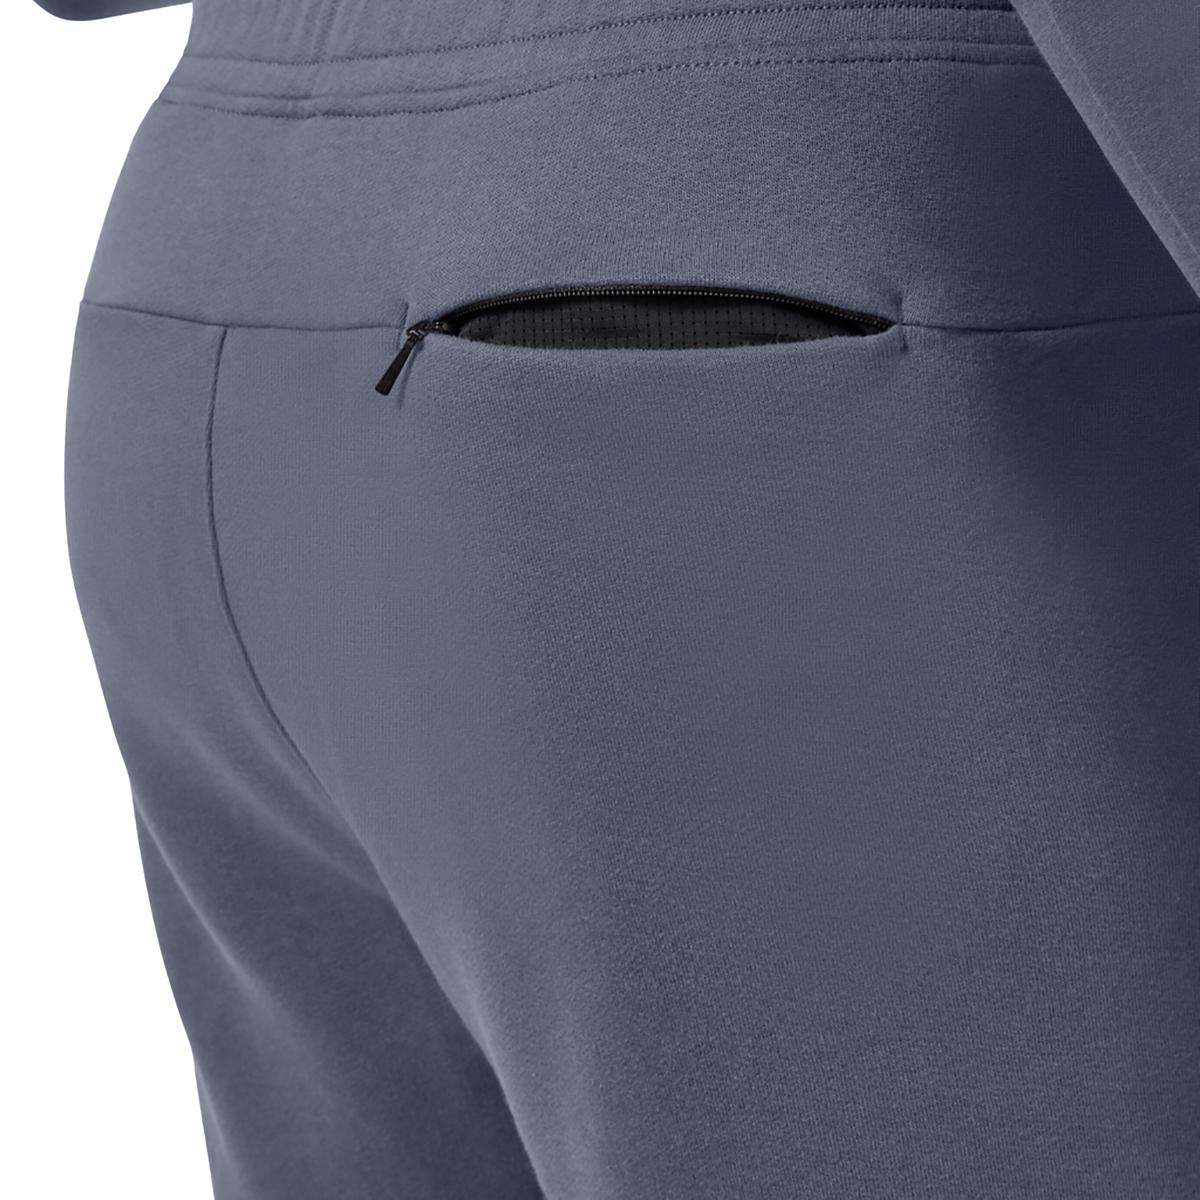 Men's On Sweat Shorts - Color: Dark - Size: S, Dark, large, image 4